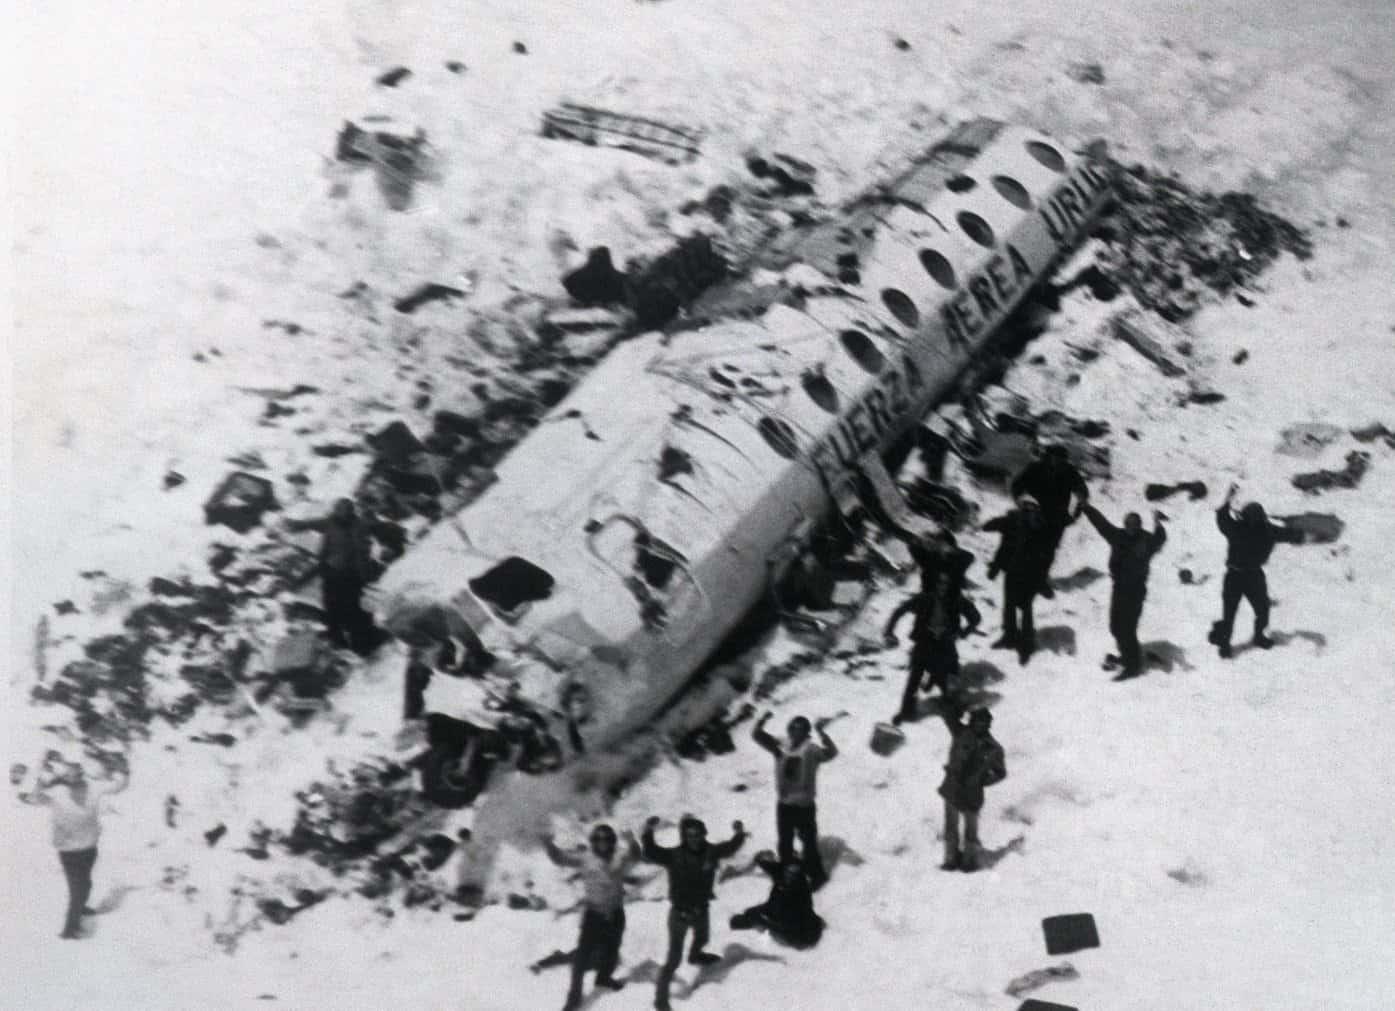 Andes 1972 Plane Crash Museum In Montevideo Guru Guay